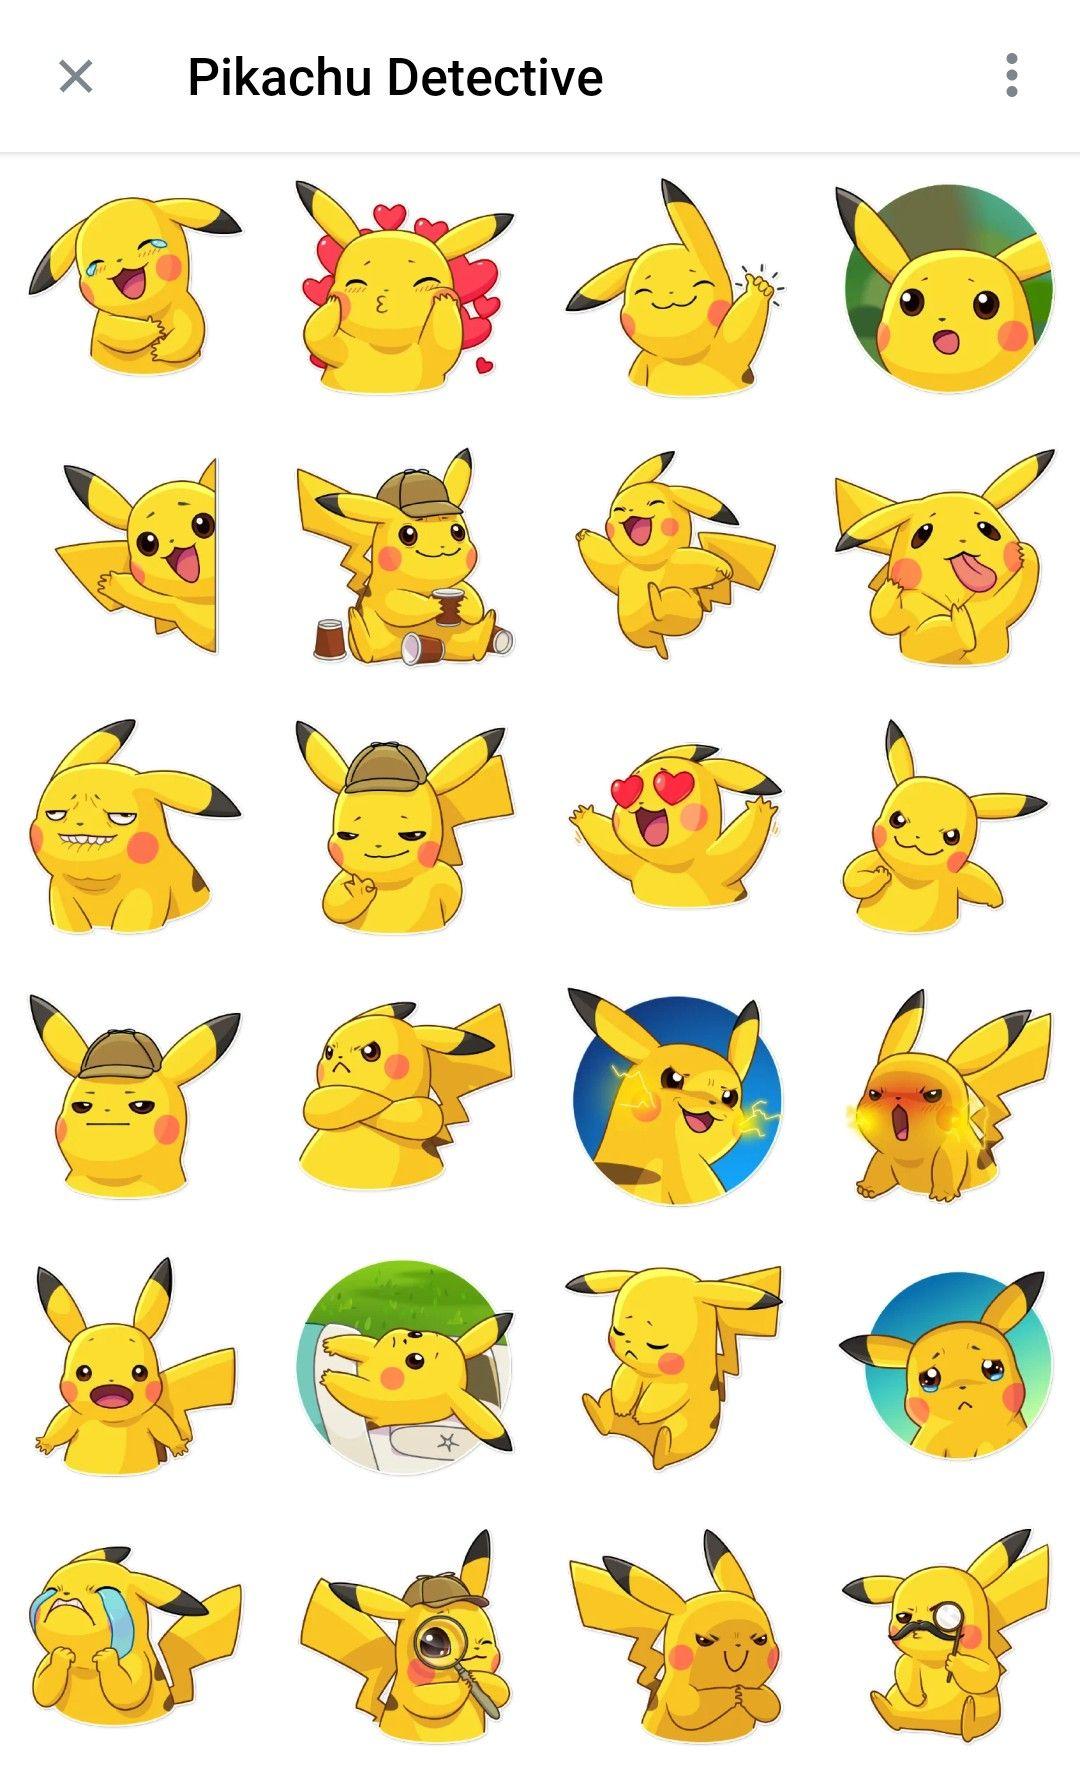 Pikachu Detective Telegram Sticker Packs In 2020 Pikachu Drawing Pikachu Pikachu Art